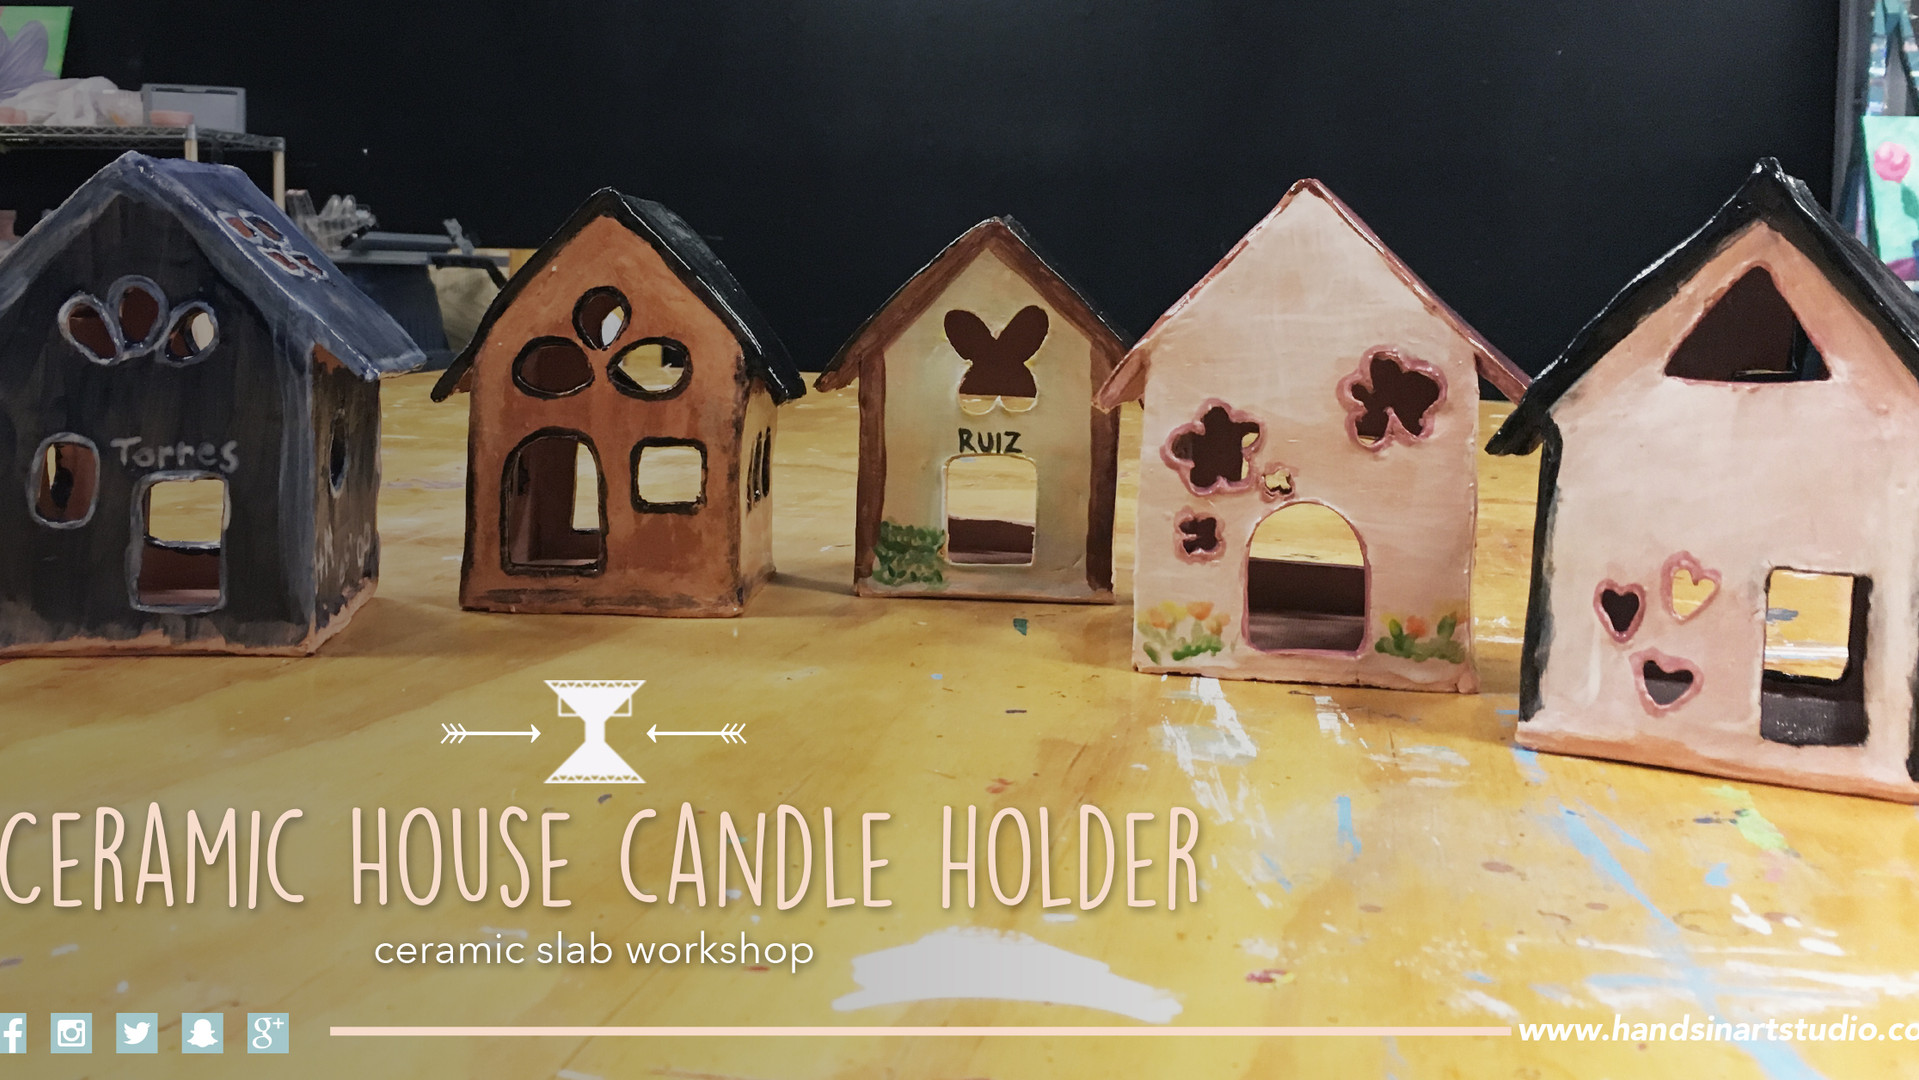 Ceramic House Candle Holder